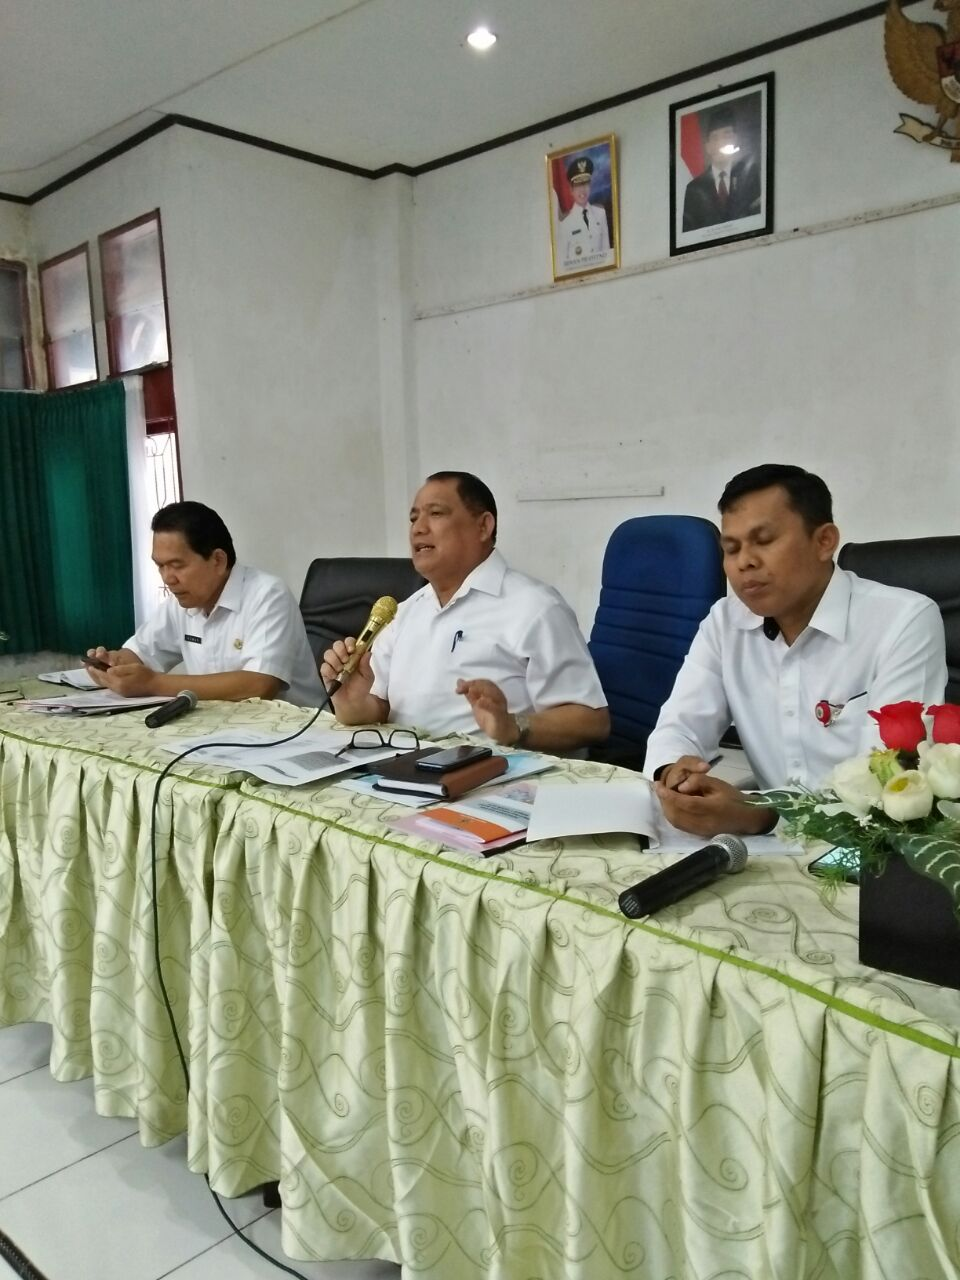 Penyaluran Dana Desa 2018 Tahap I di Sumbar Rampung Minggu Pertama Juni